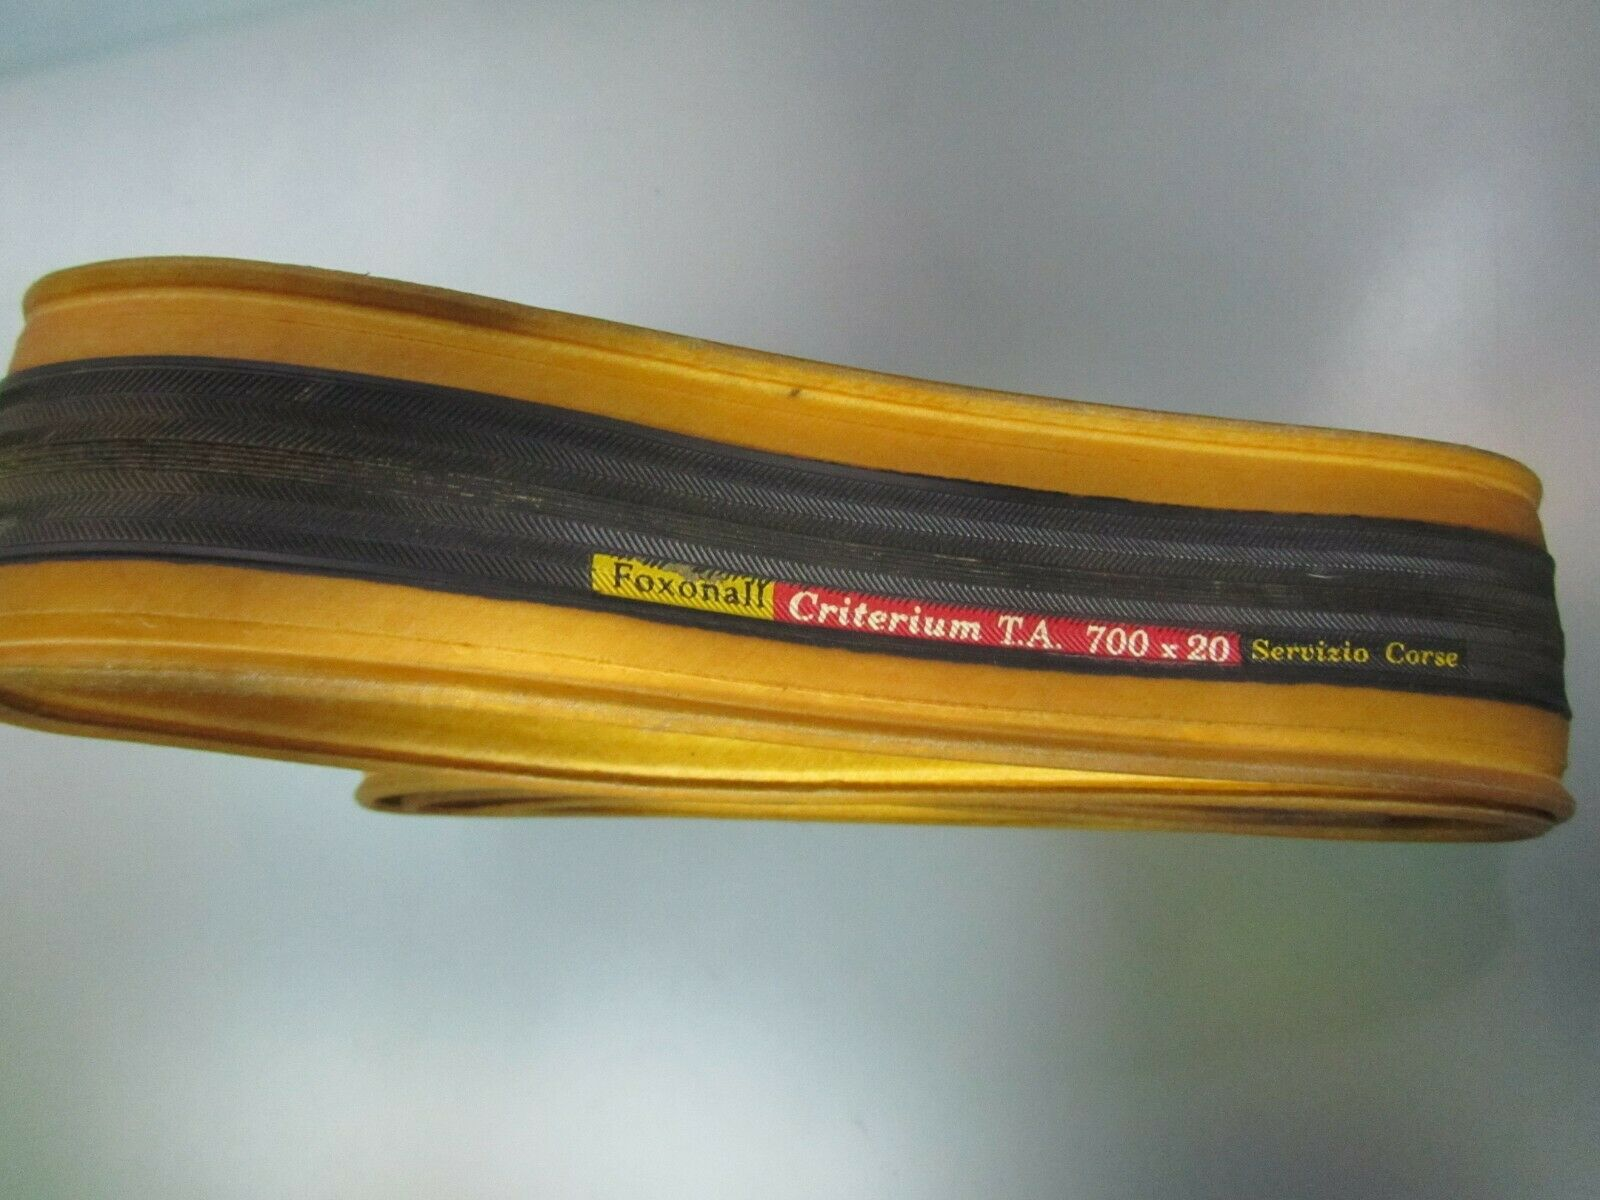 Vintage Foxonall Criterium T.A. 700x20 clincher tire. Very rare. NOS